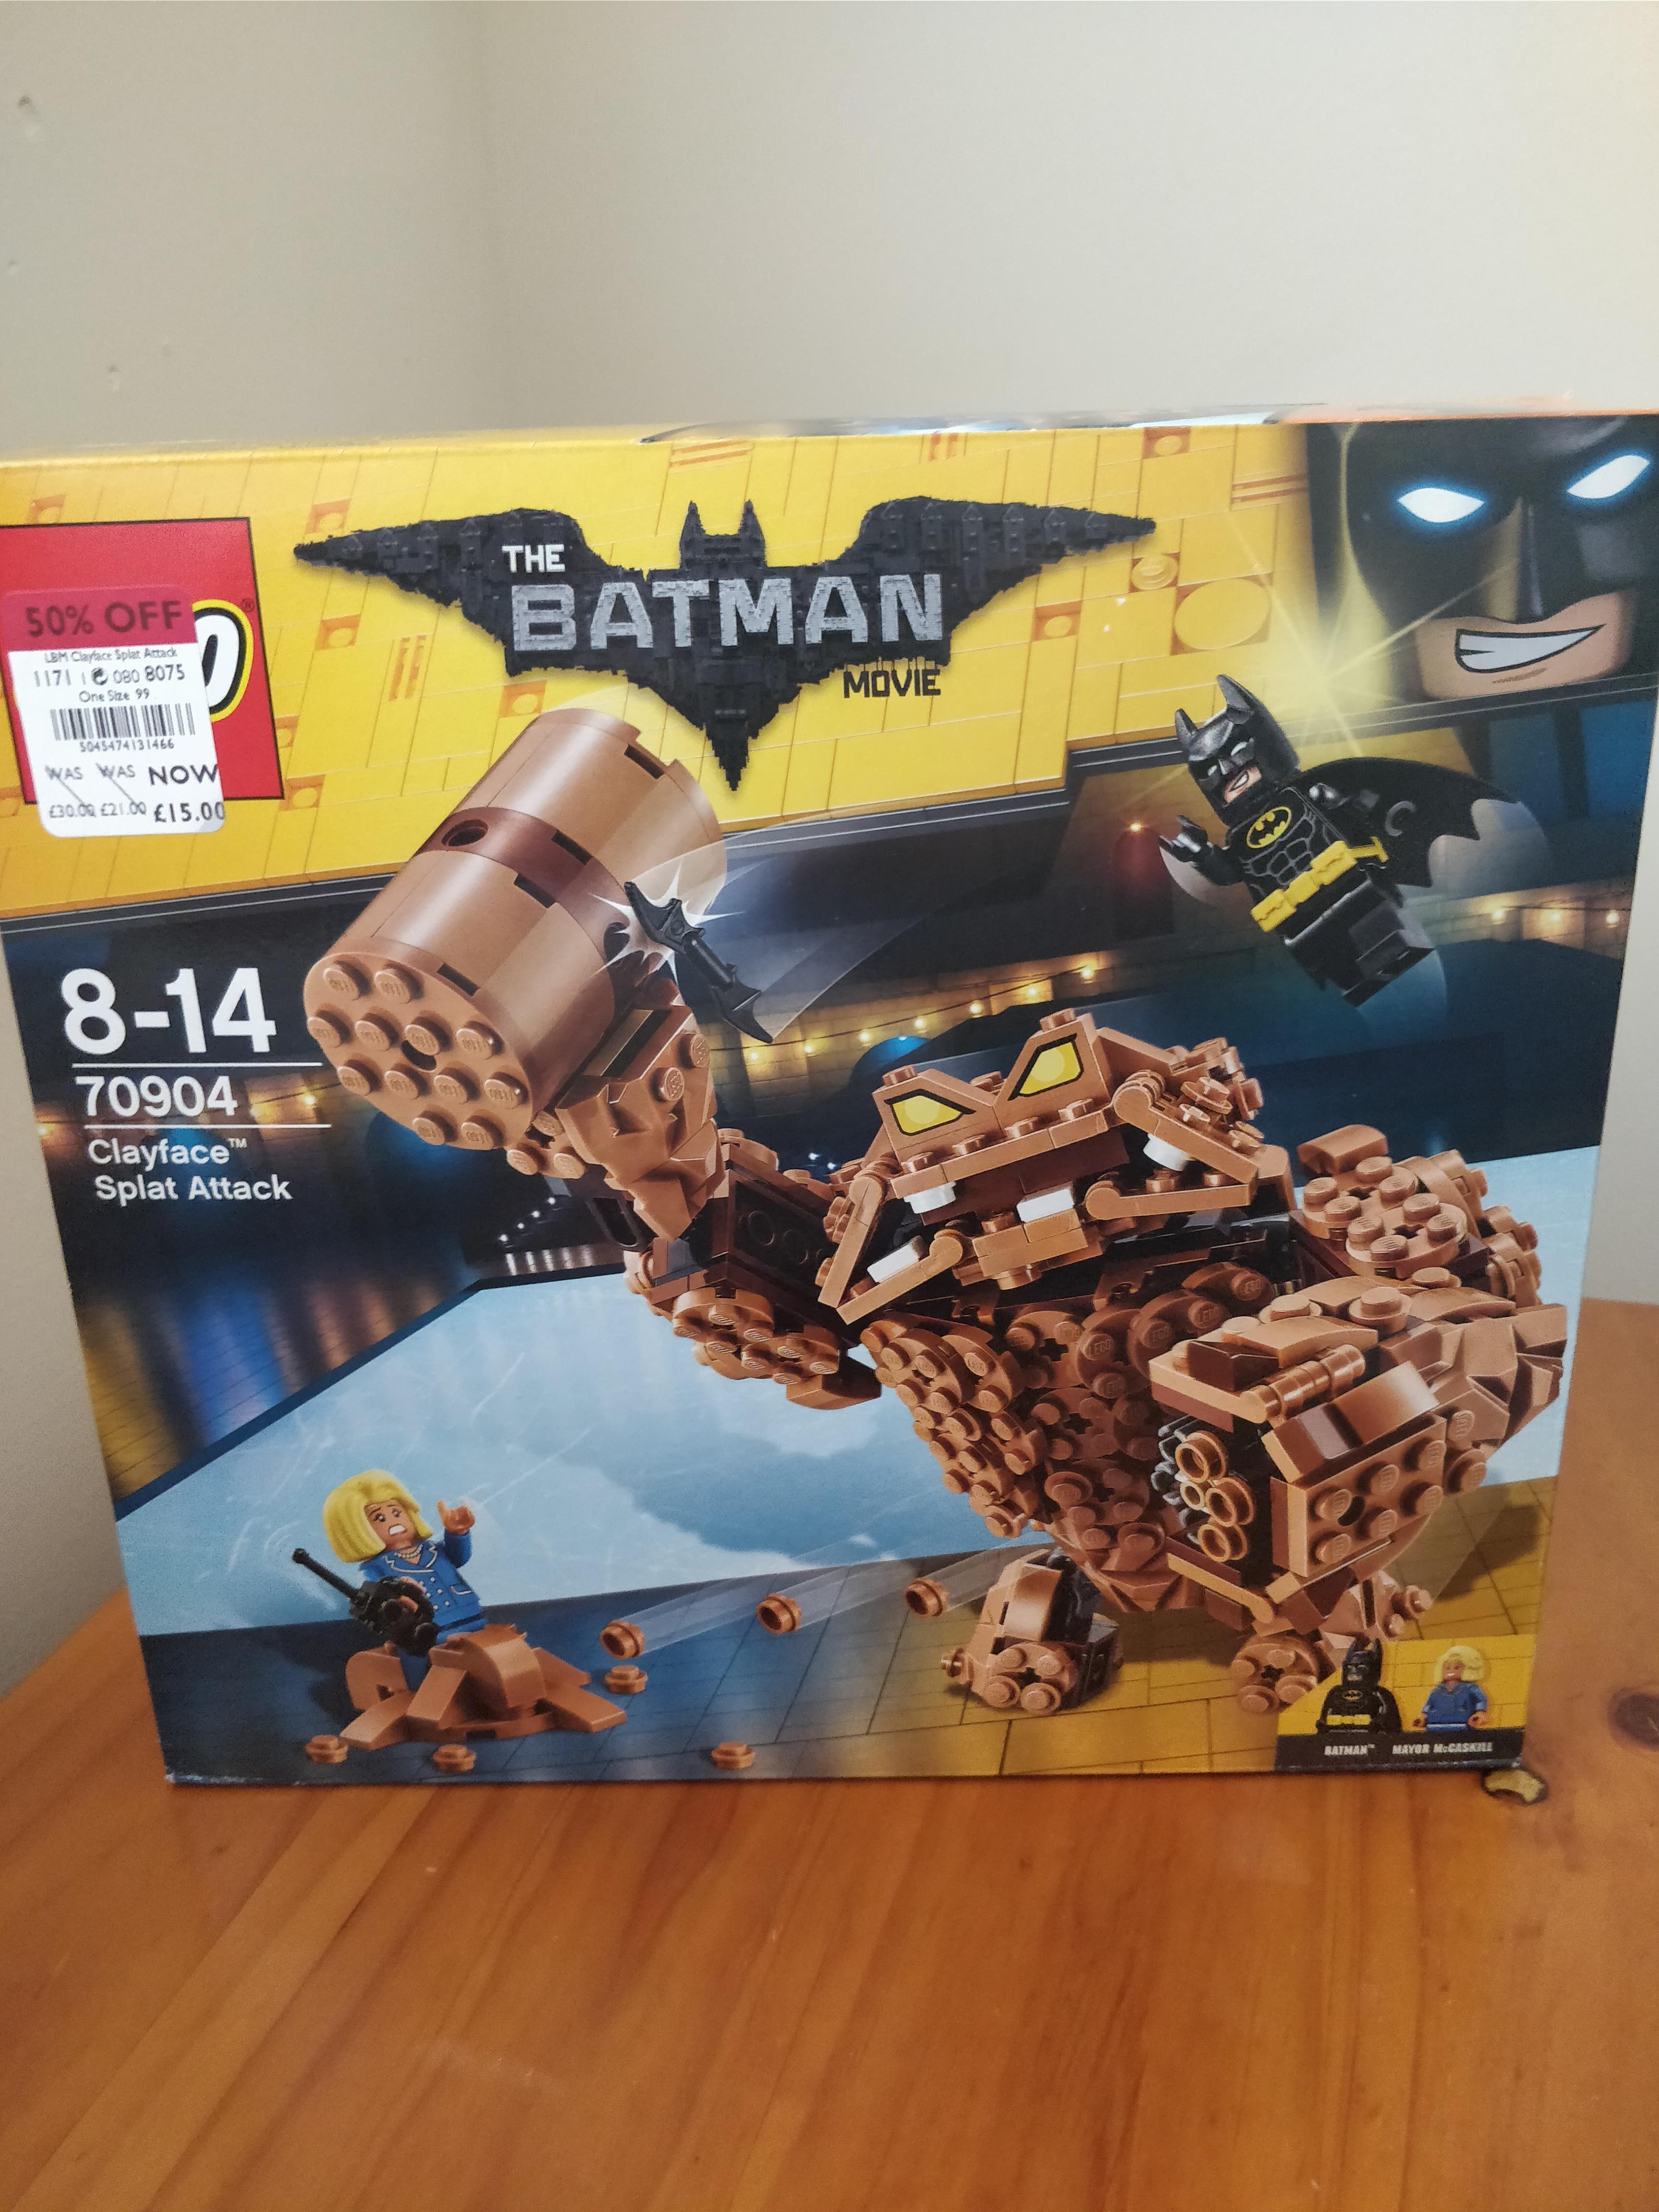 Lego Clayface Splat Attack 50% off £15 at Debenhams - Craigavon